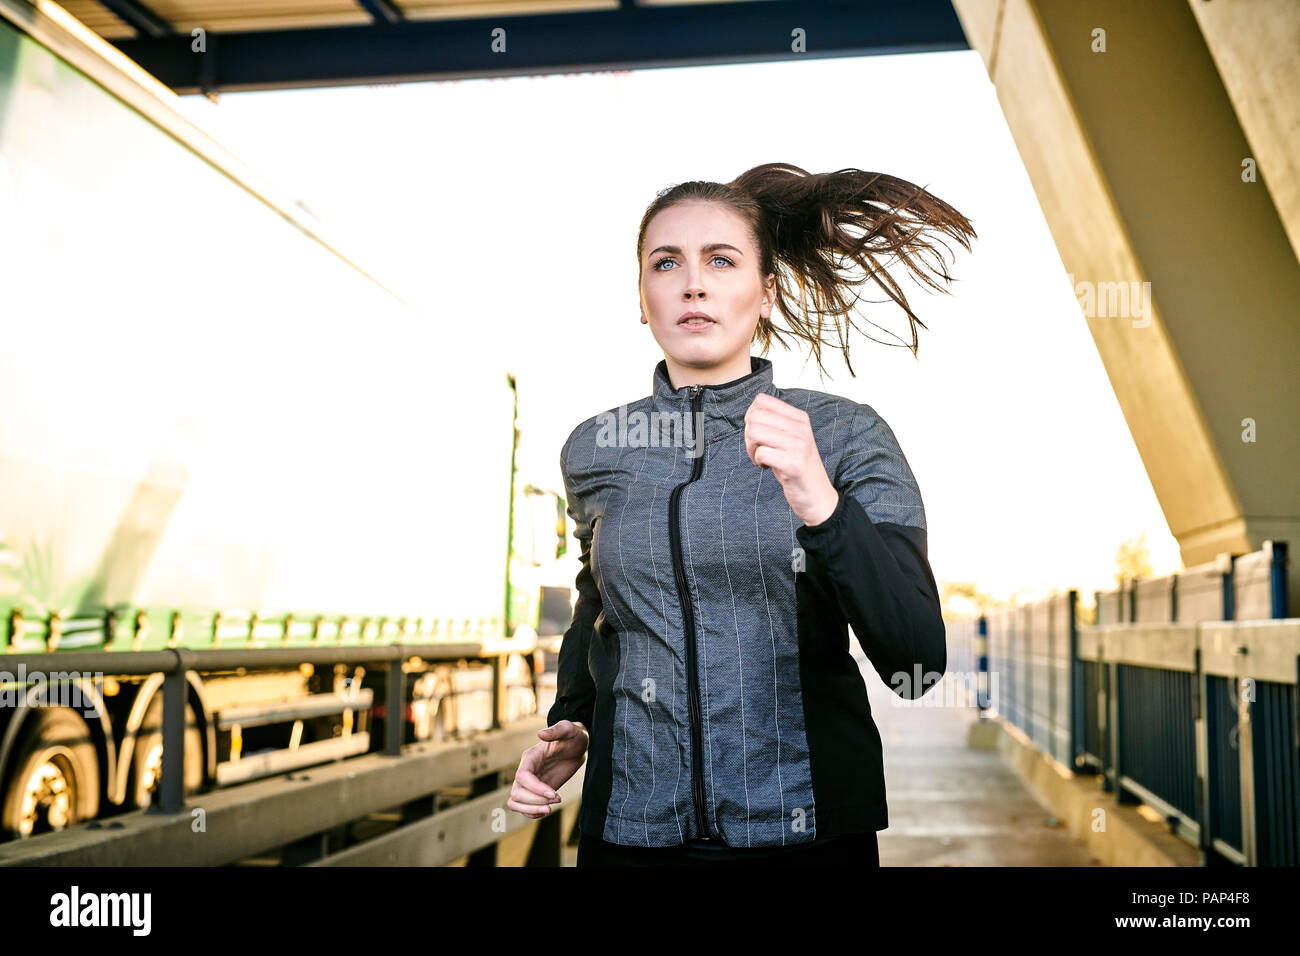 Portrait of sportive woman jogging - Stock Image